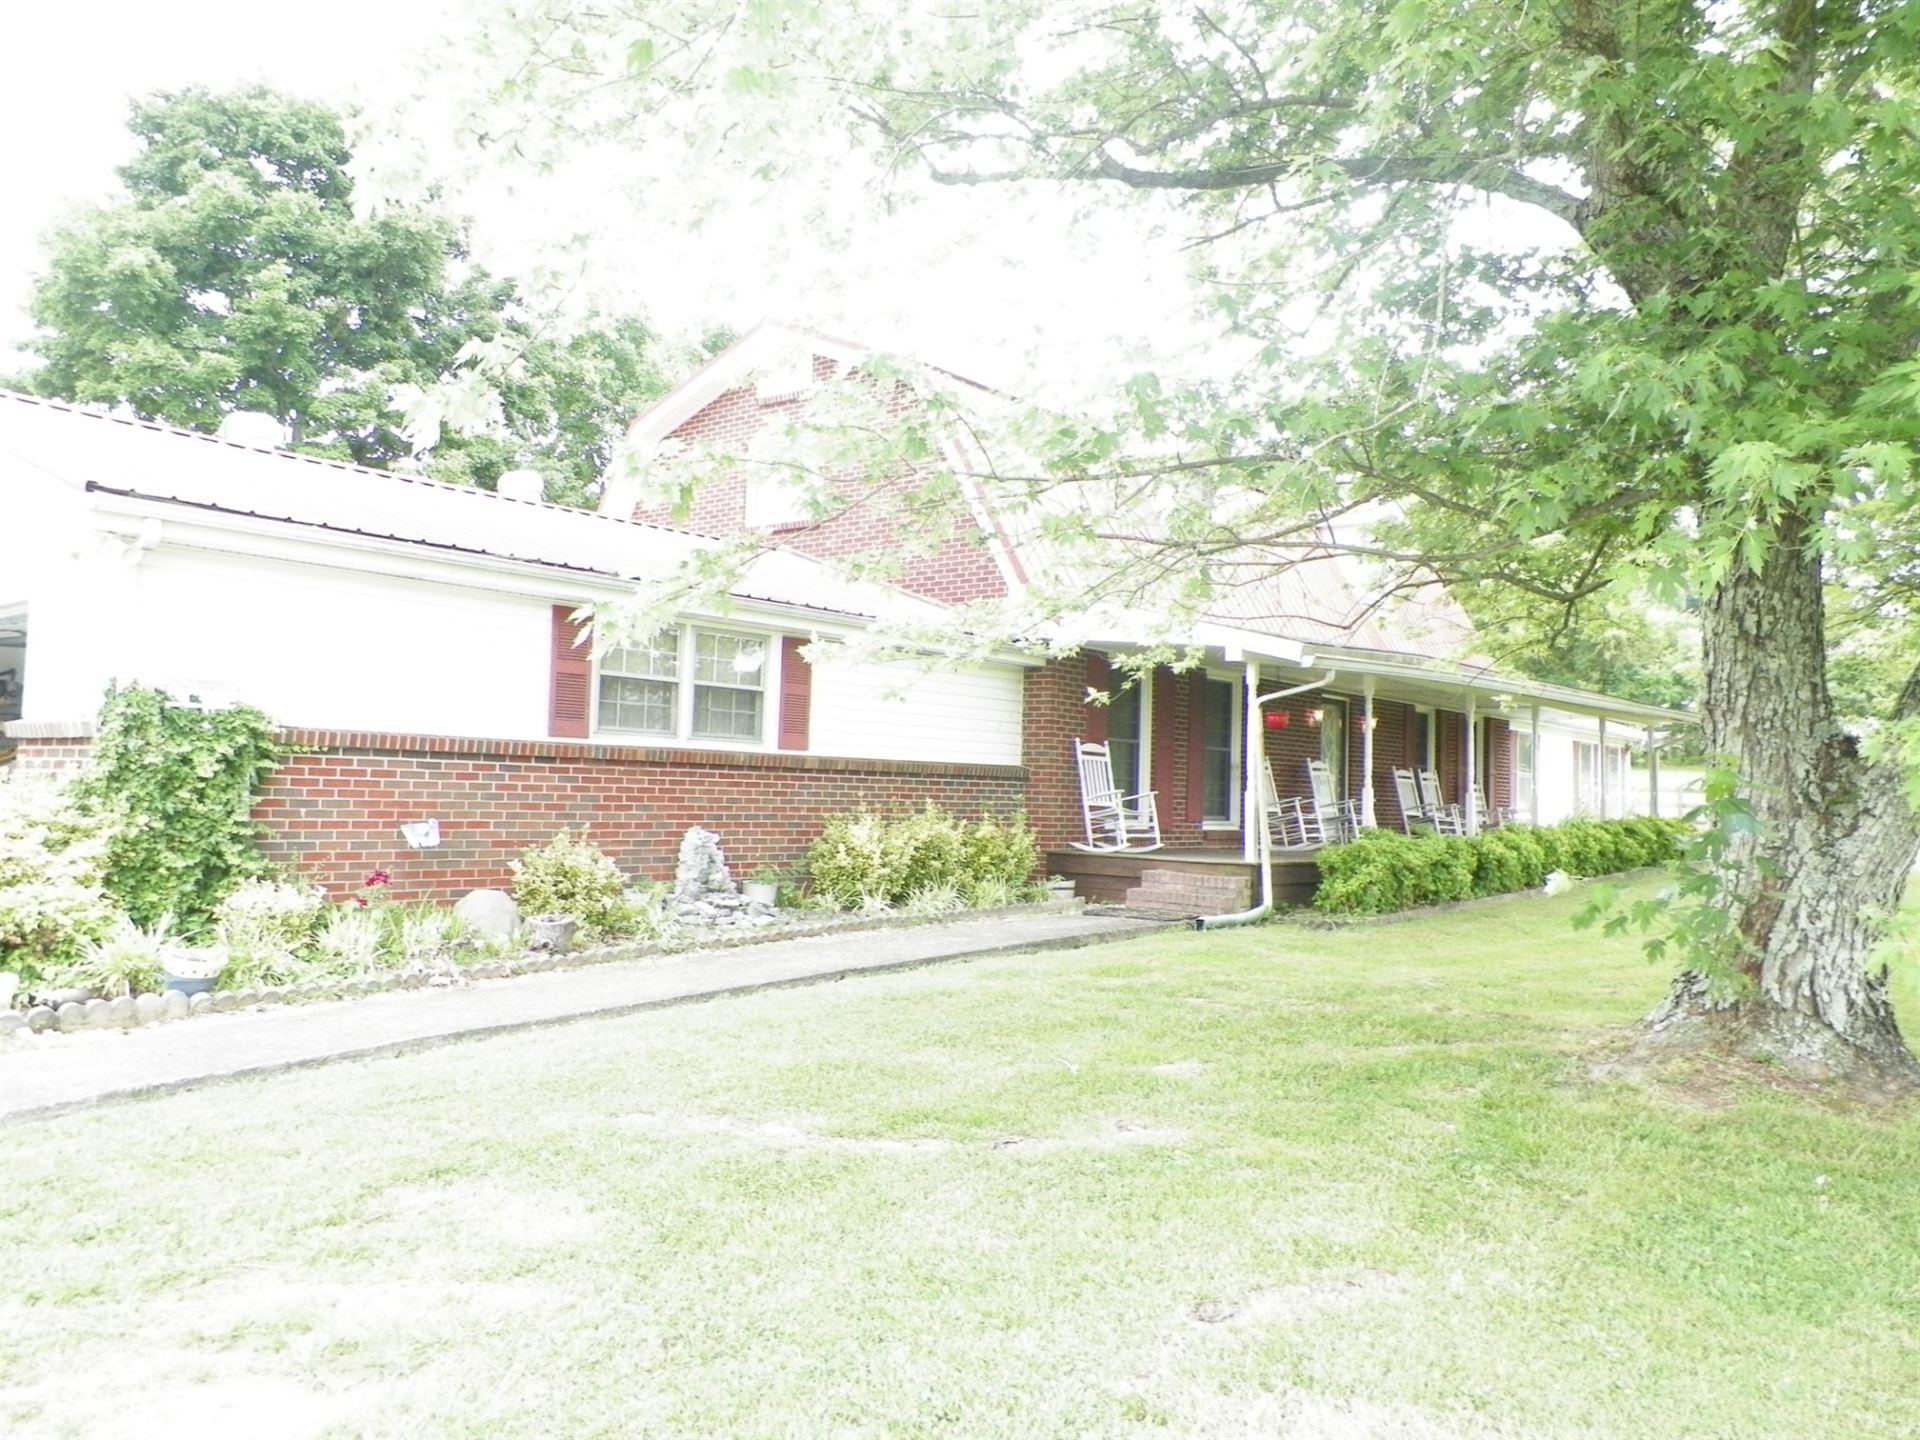 337 S Palmers Chapel Rd, Cottontown, TN 37048 - MLS#: 2163258